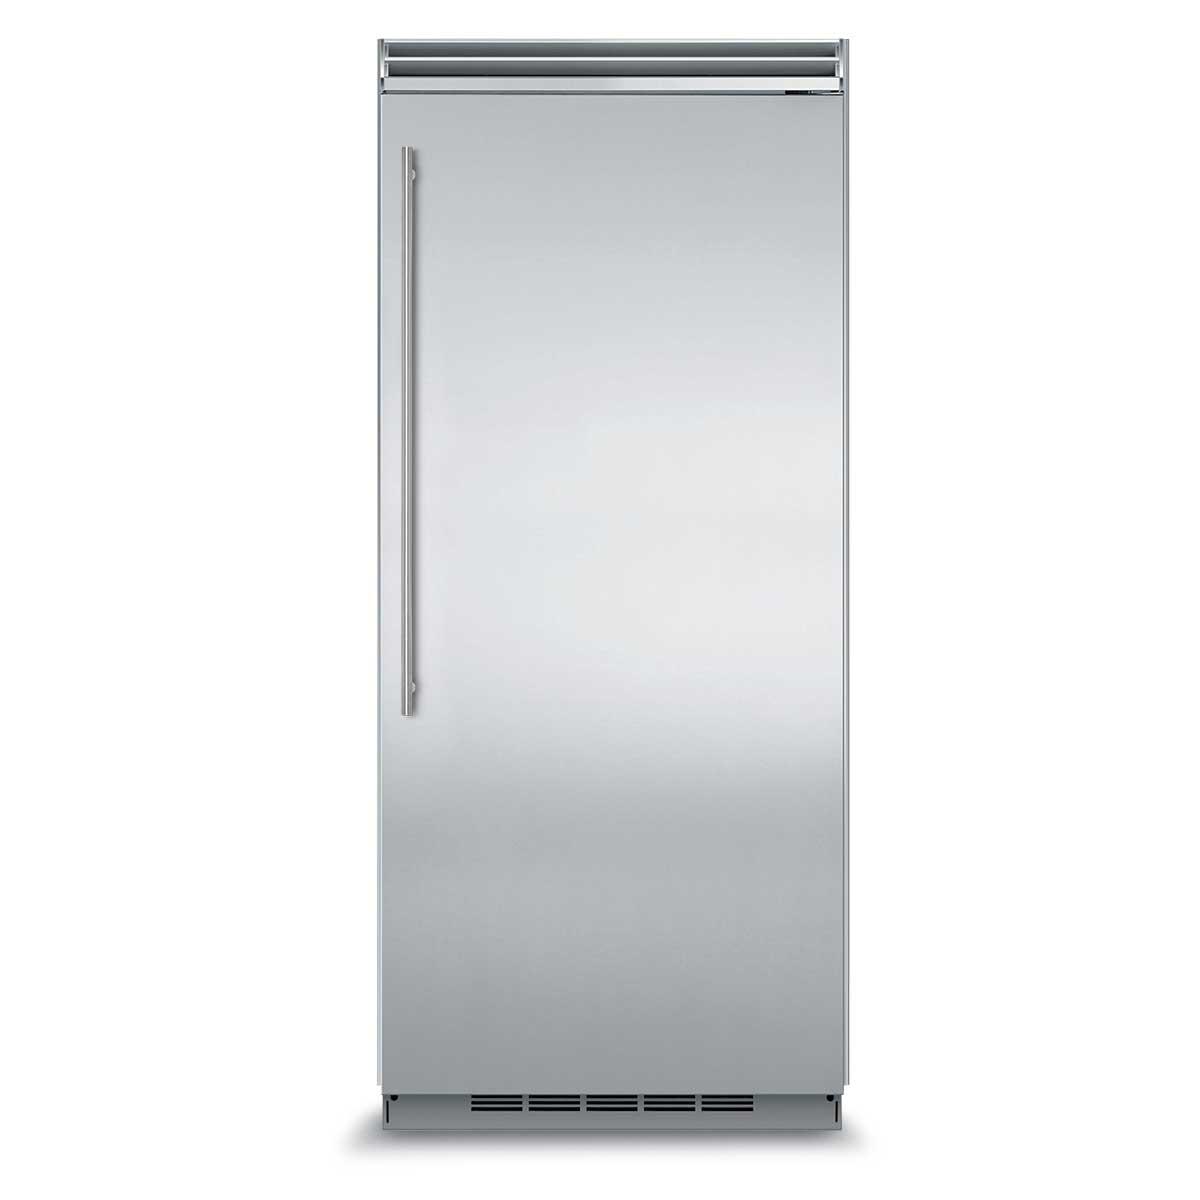 "Model: MP36FA2LS | Marvel  Marvel Professional Built-In 36"" All Freezer- Solid Stainless Steel Door   Left Hinge, Slim Designer Handle"